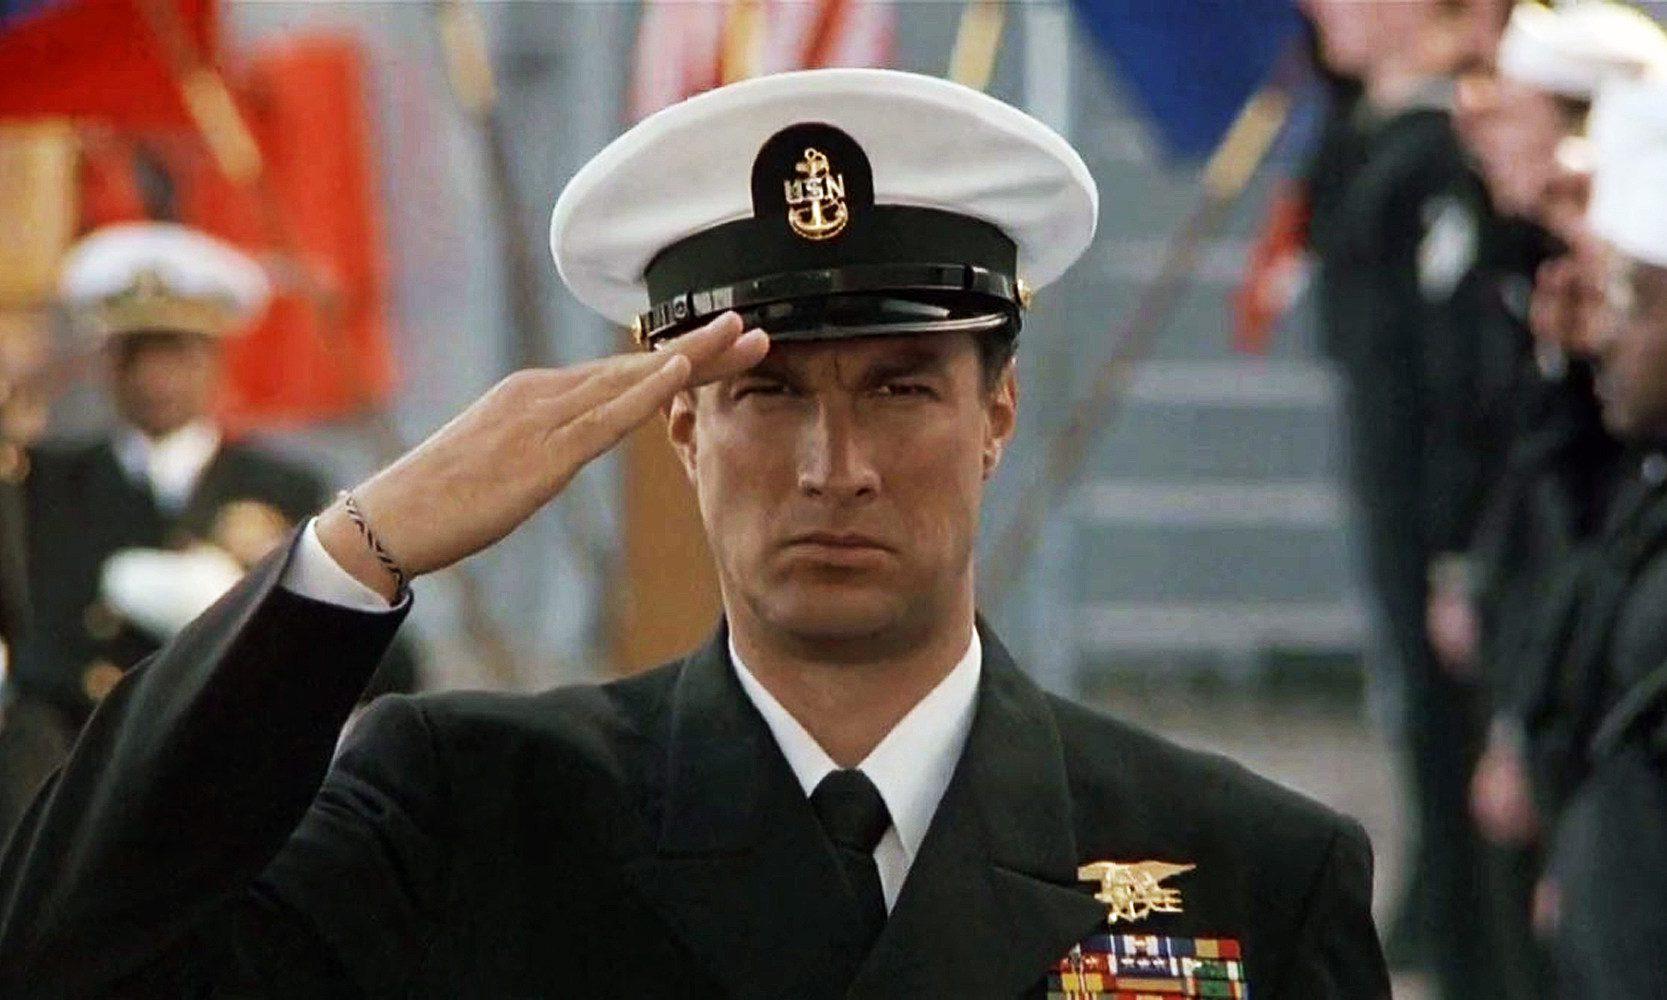 Steven Seagal saluting